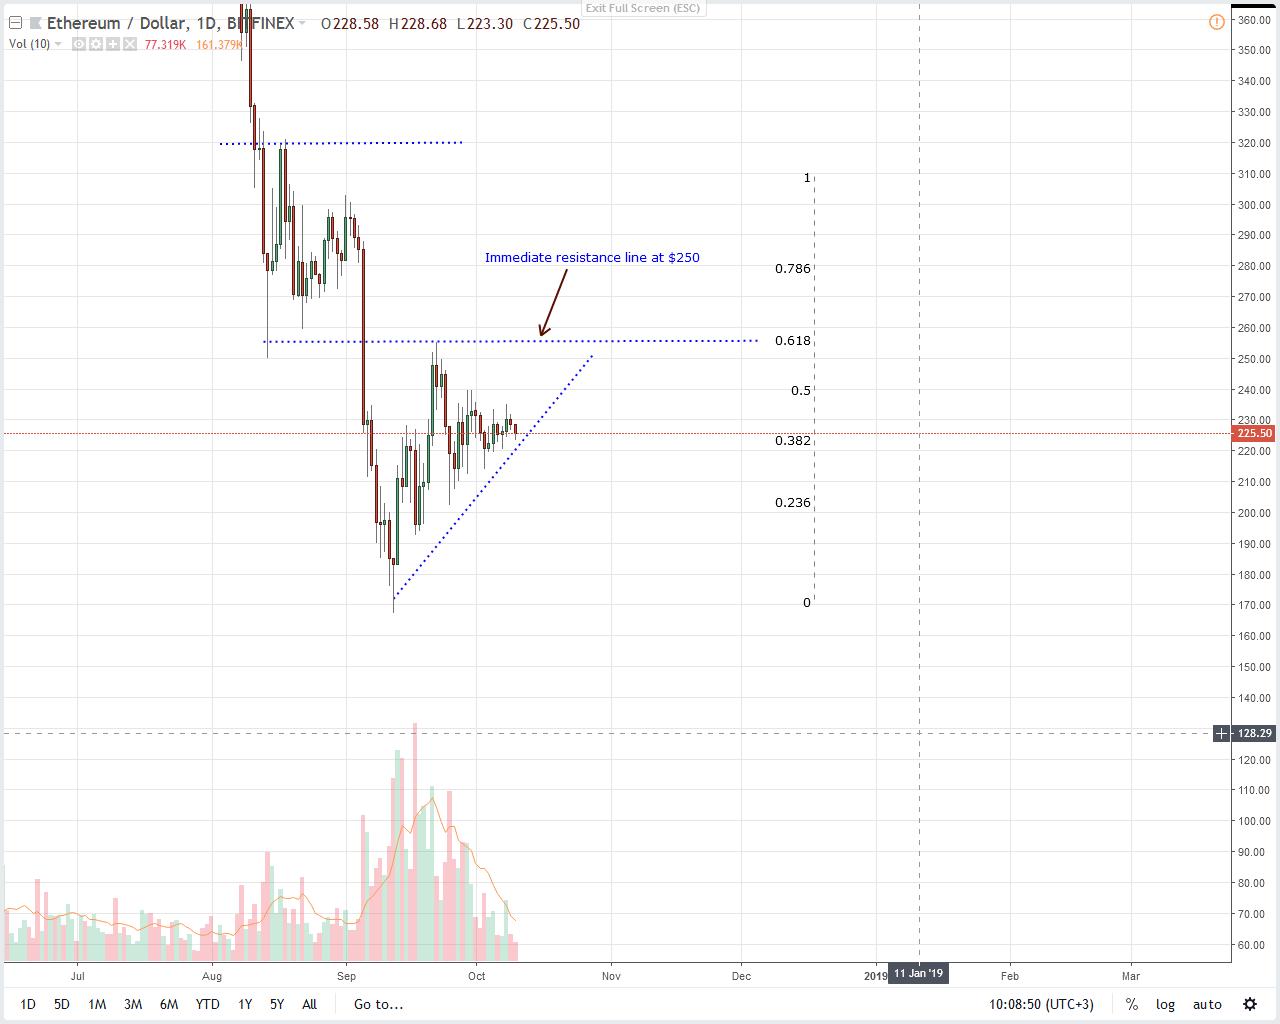 Ether (ETH) price analysis